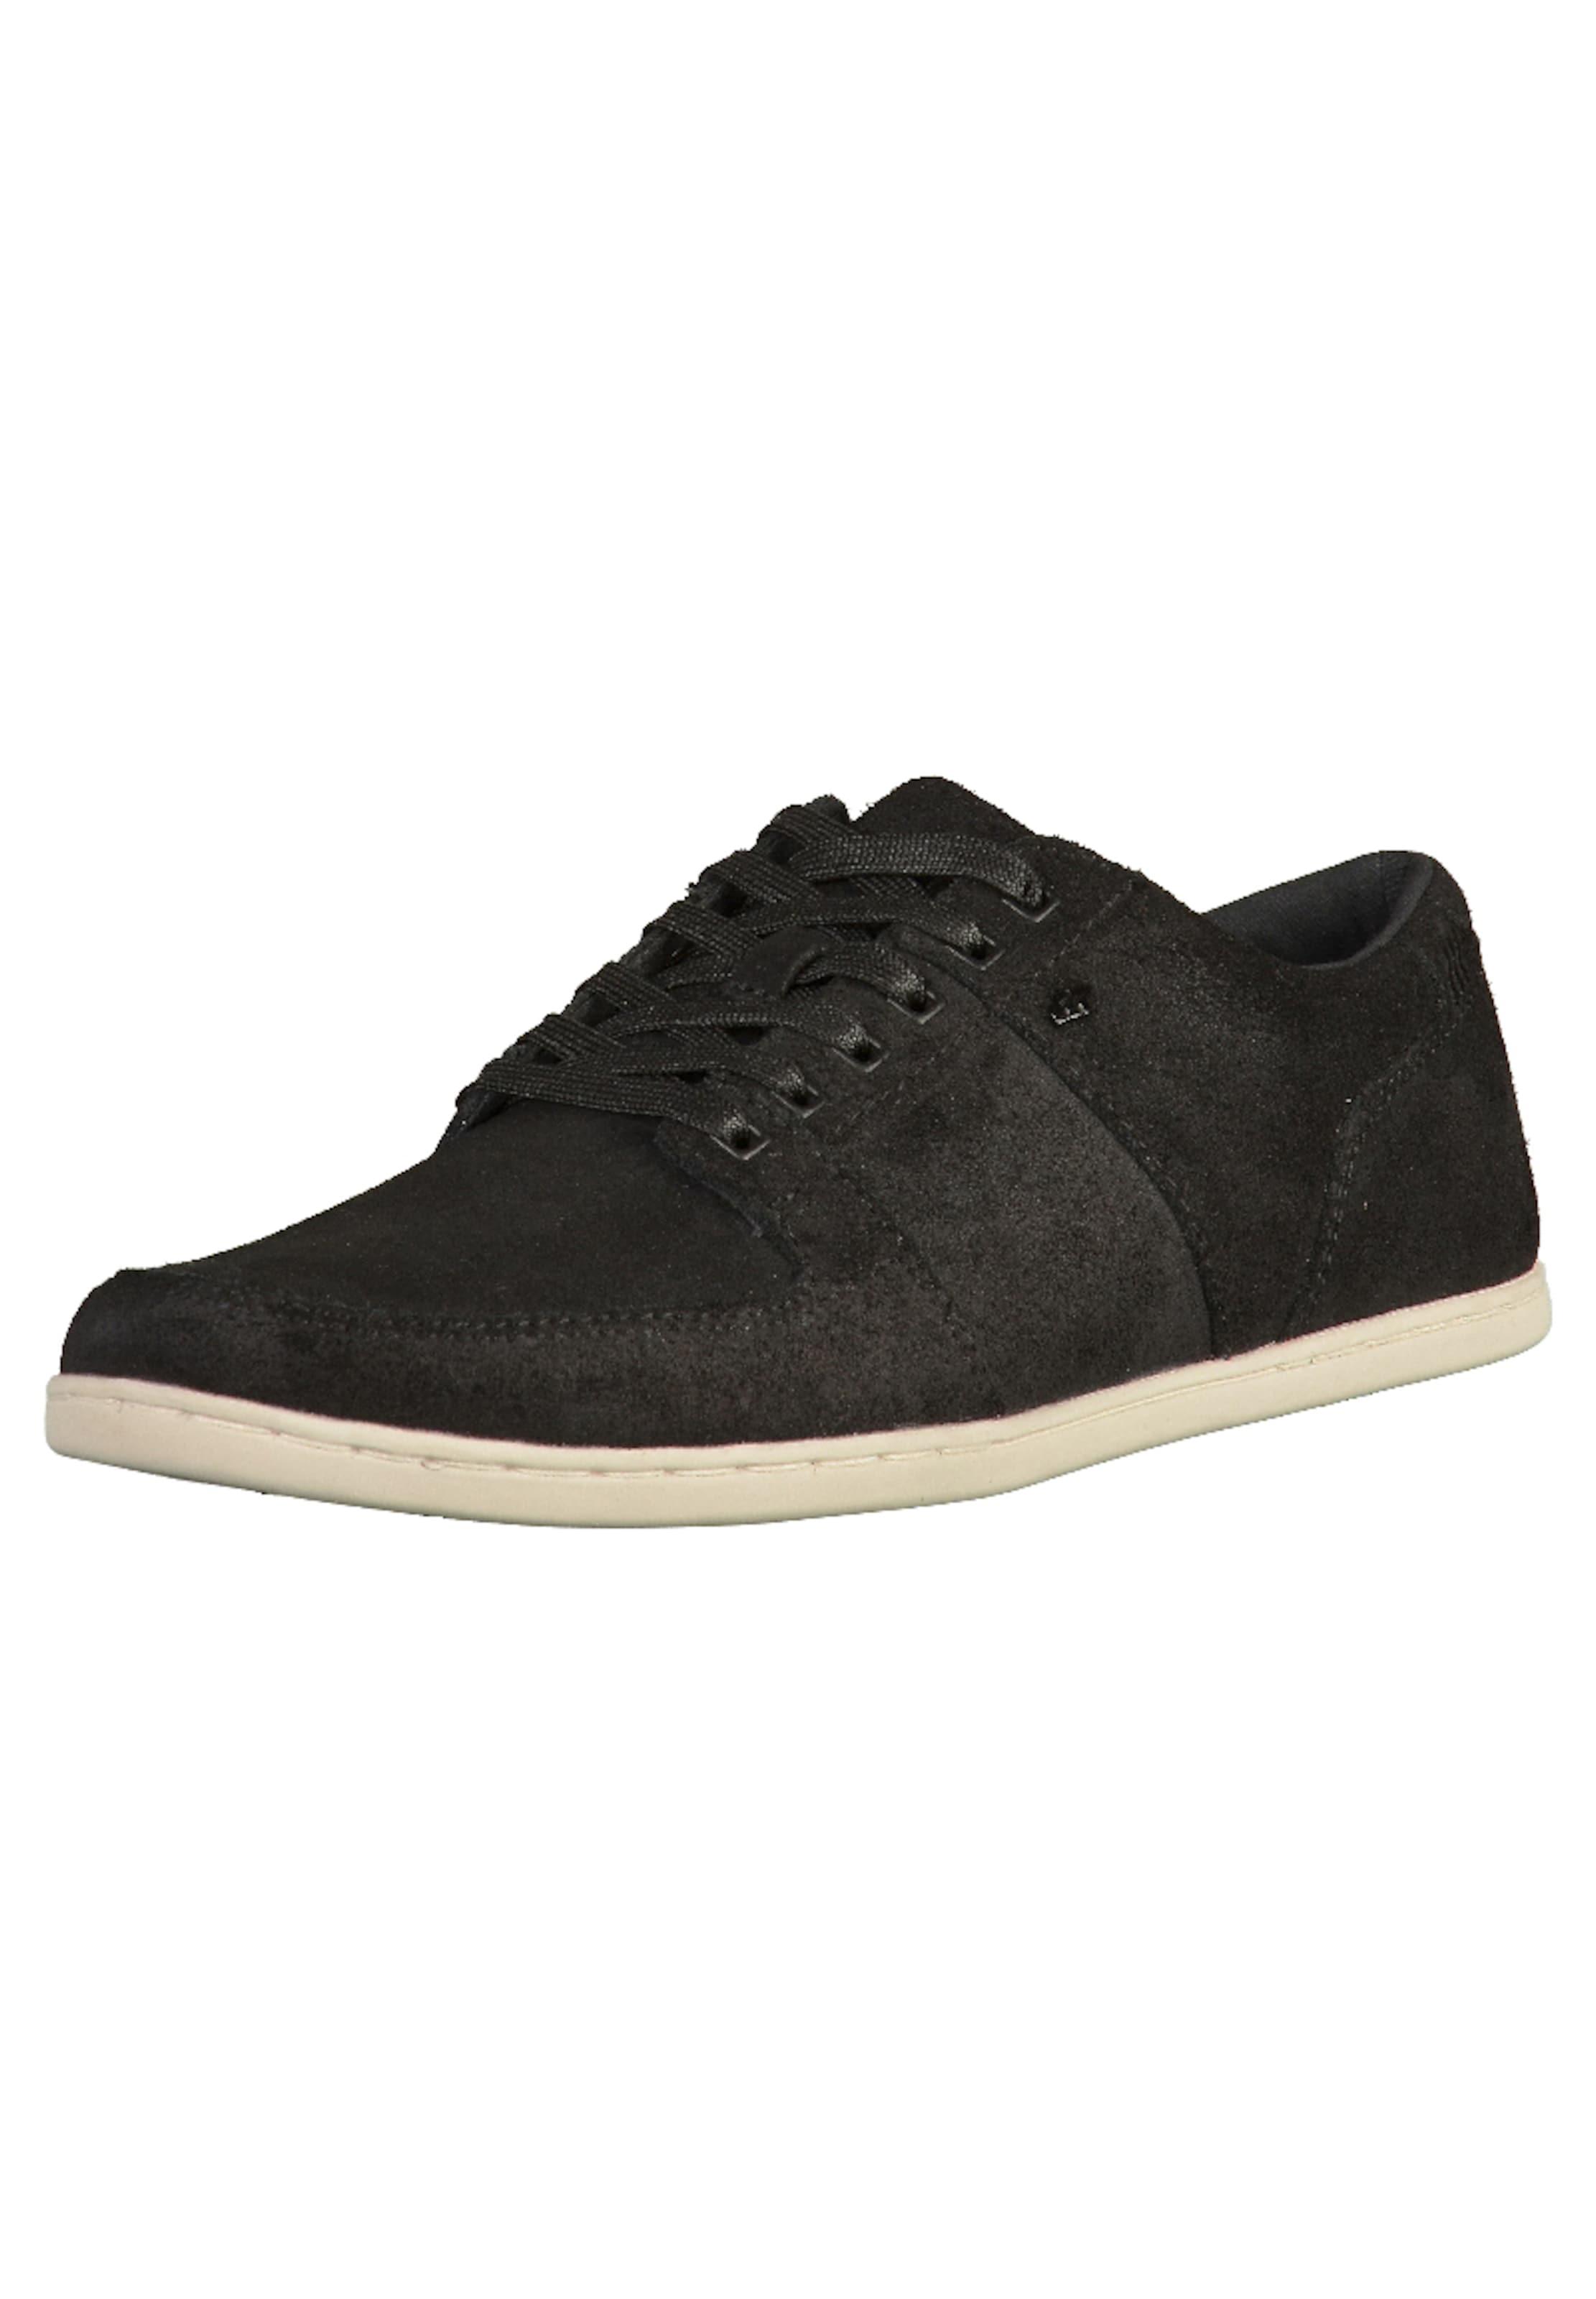 Haltbare Mode billige Schuhe BOXFRESH   Sneaker Schuhe Gut getragene Schuhe